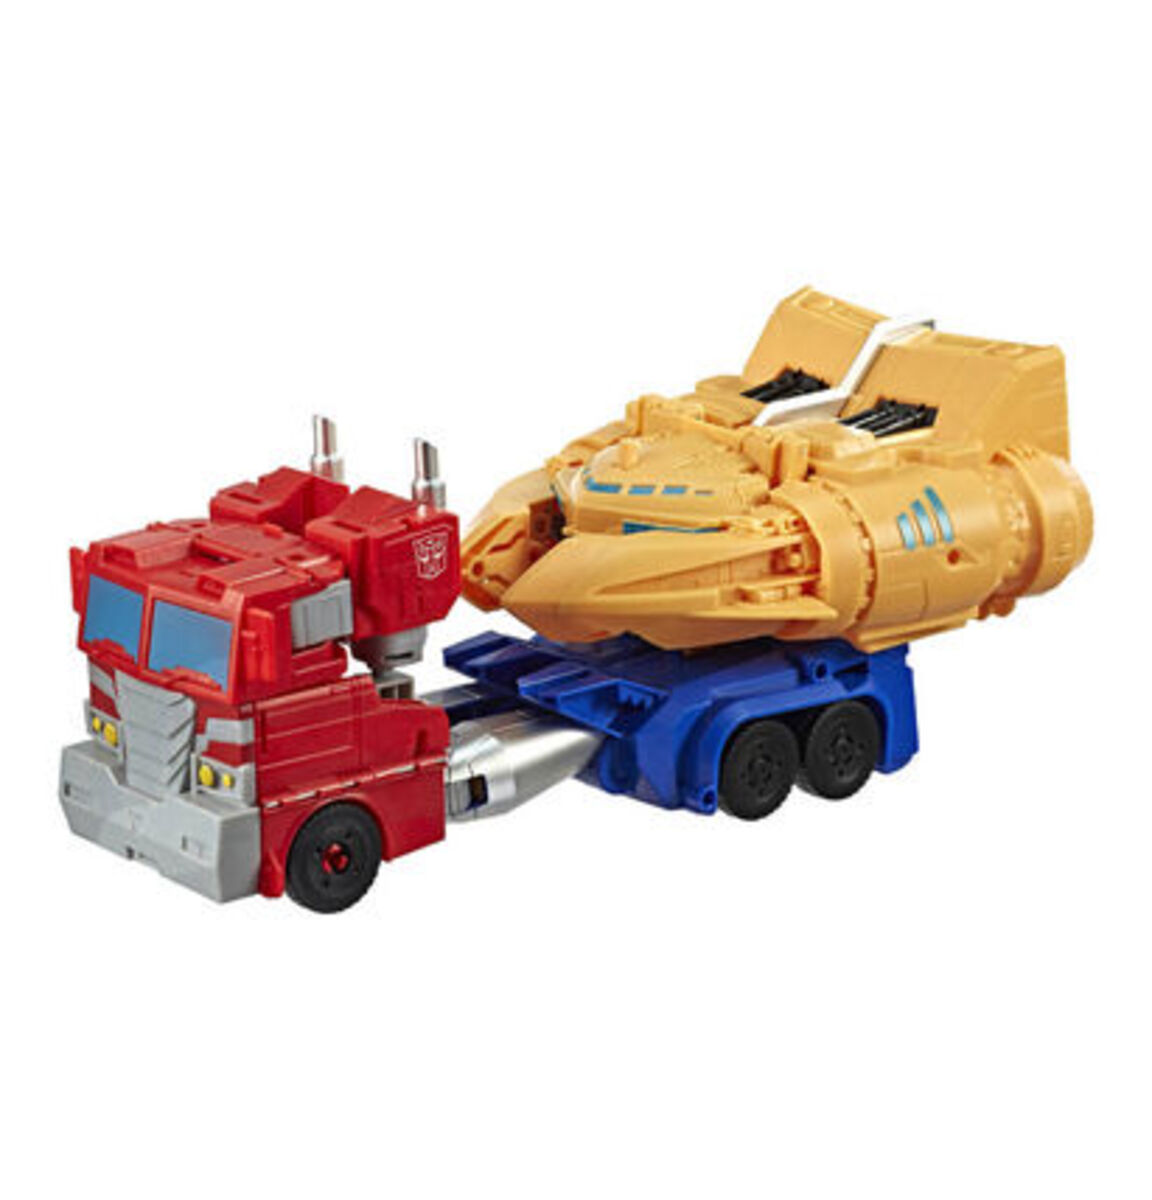 Bild 2 von Hasbro Cyberverse Spark Armor Ark Power Optimus Prime